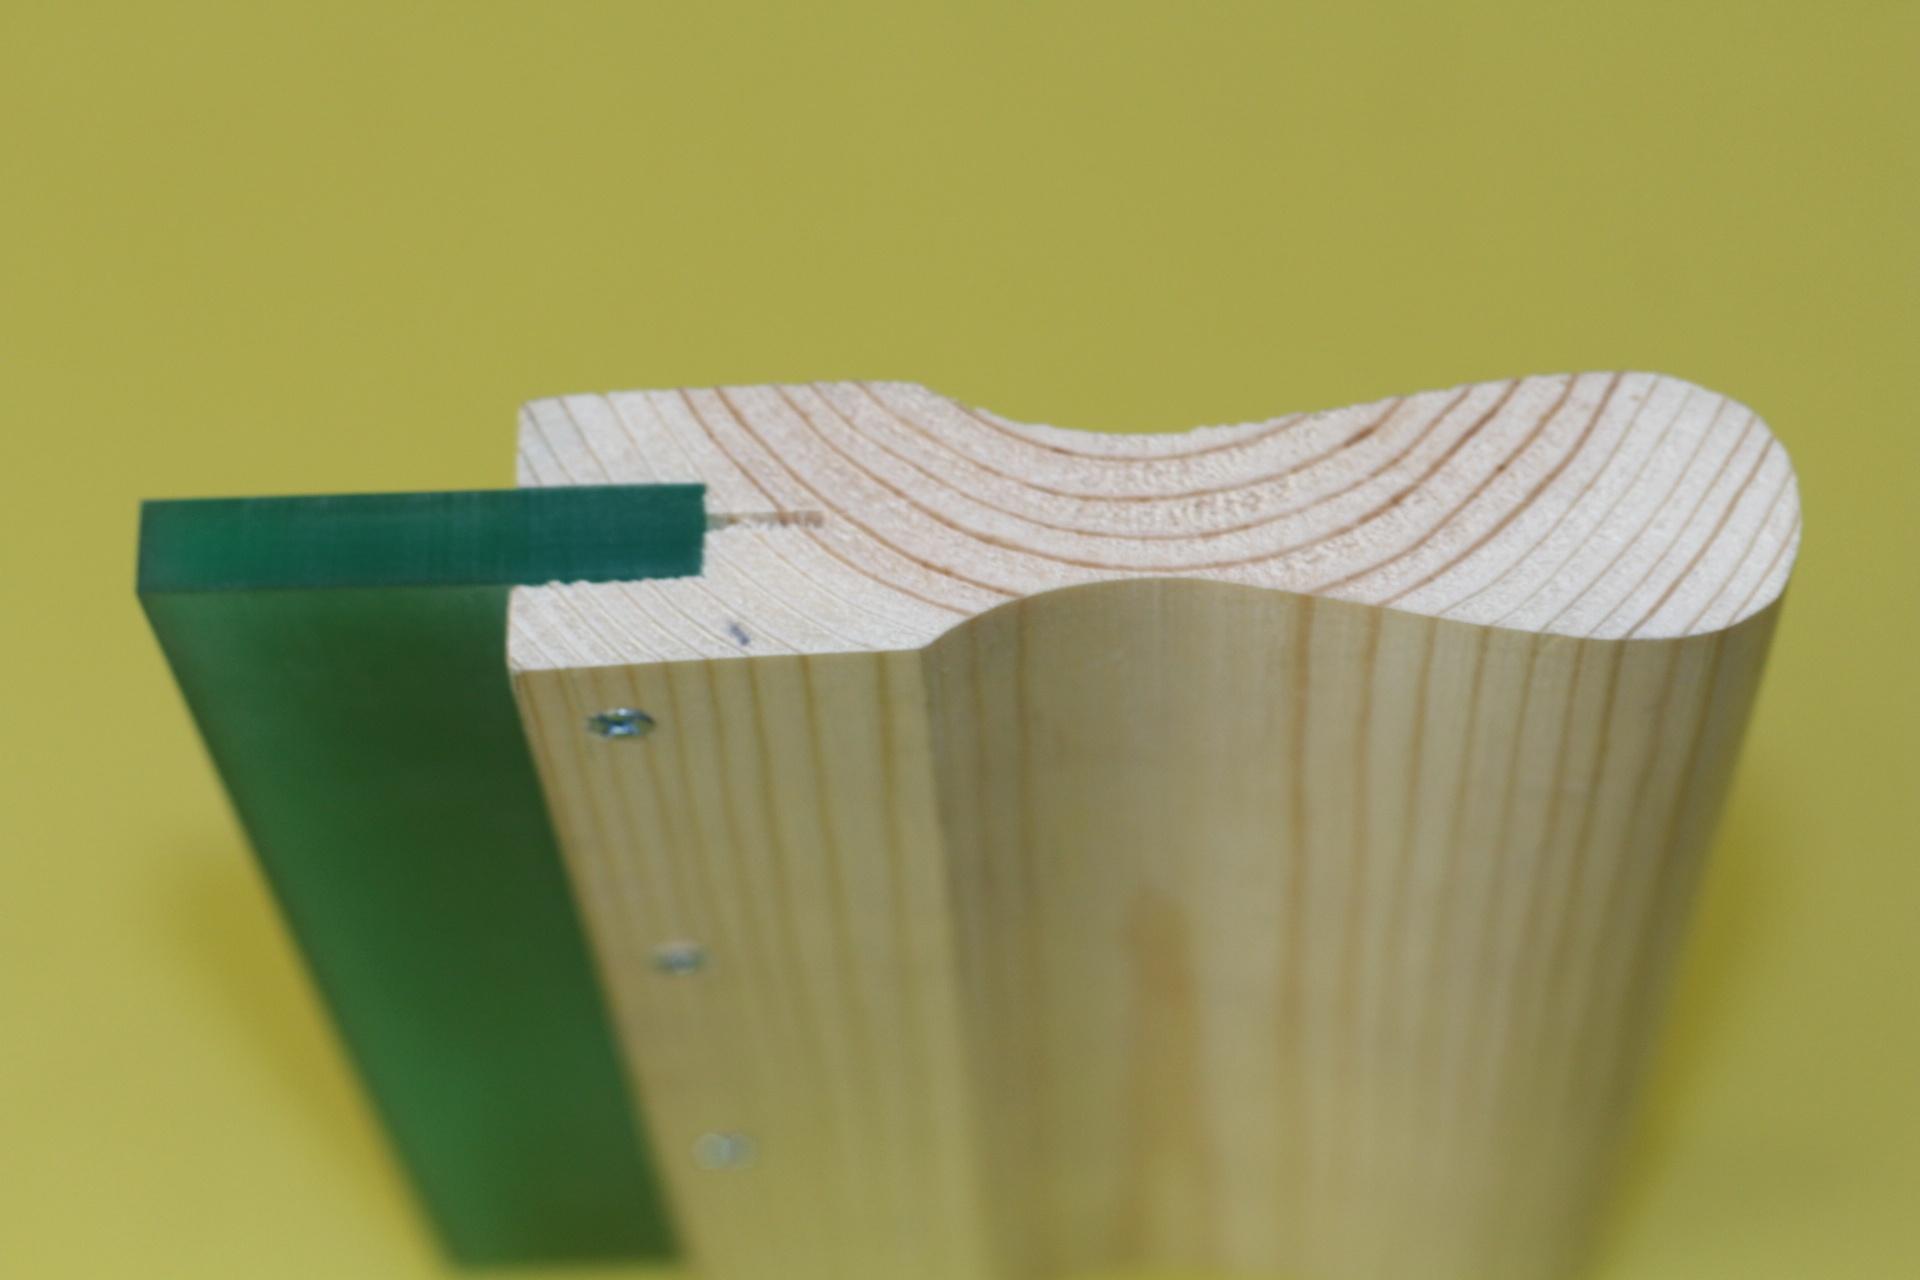 16″ 60 durometer wooden handle squeegee blade -2PC